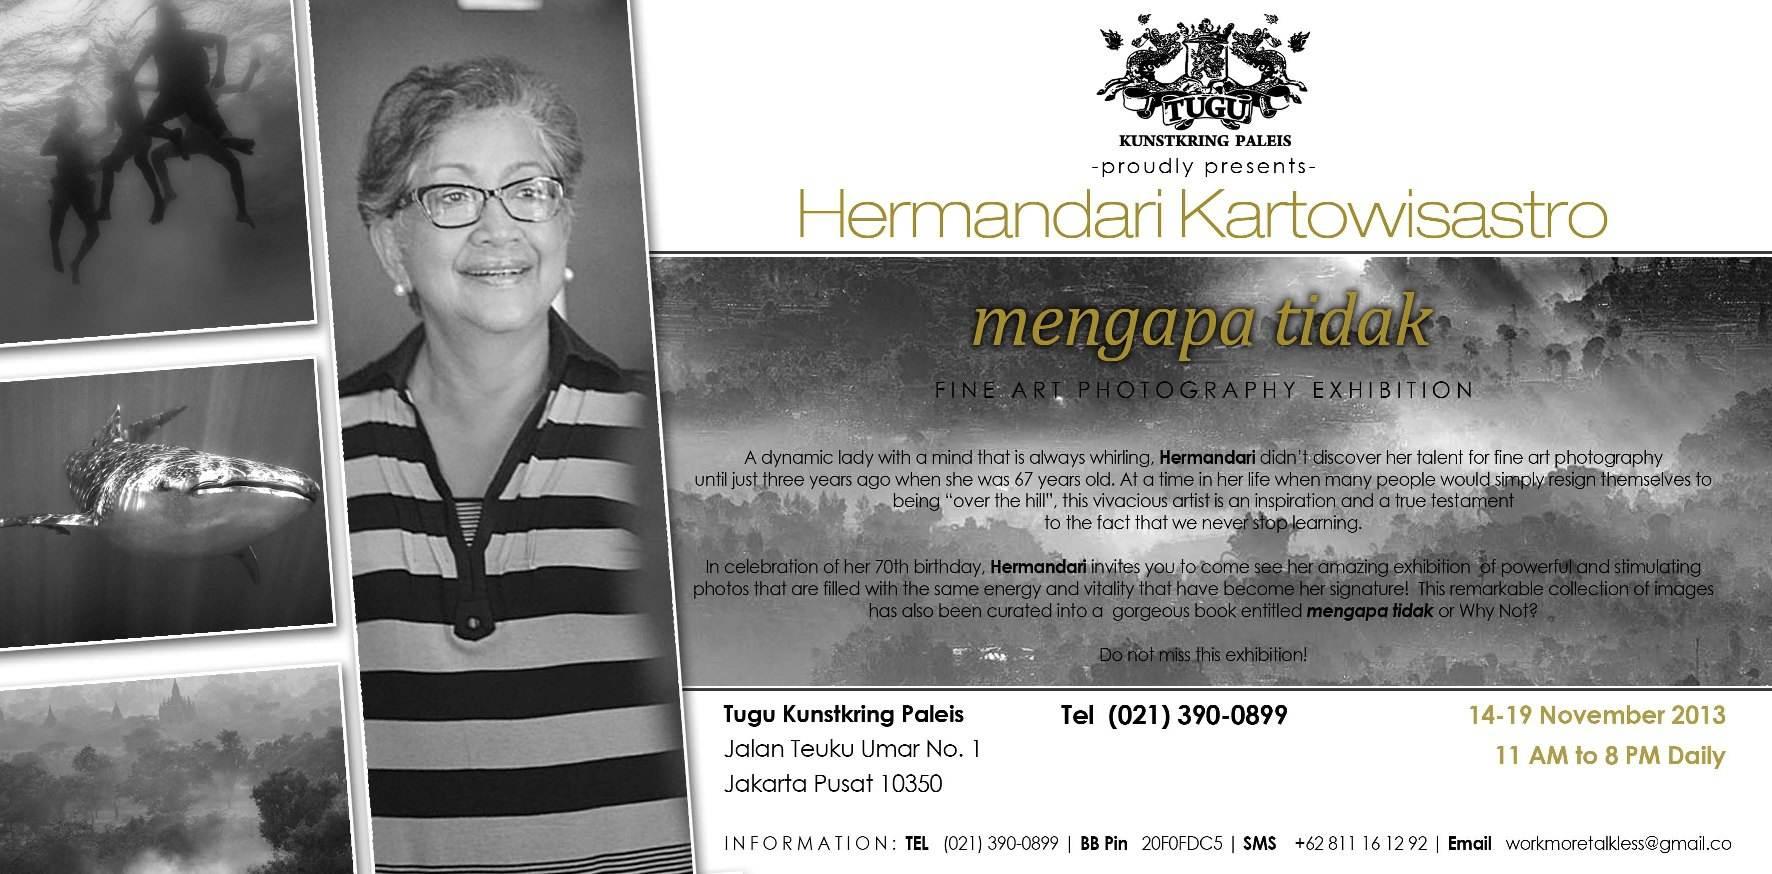 "hermandari kartowisastro ""mengapa tidak"" - fine art photography exhibiton at tugu kunstkring paleis"